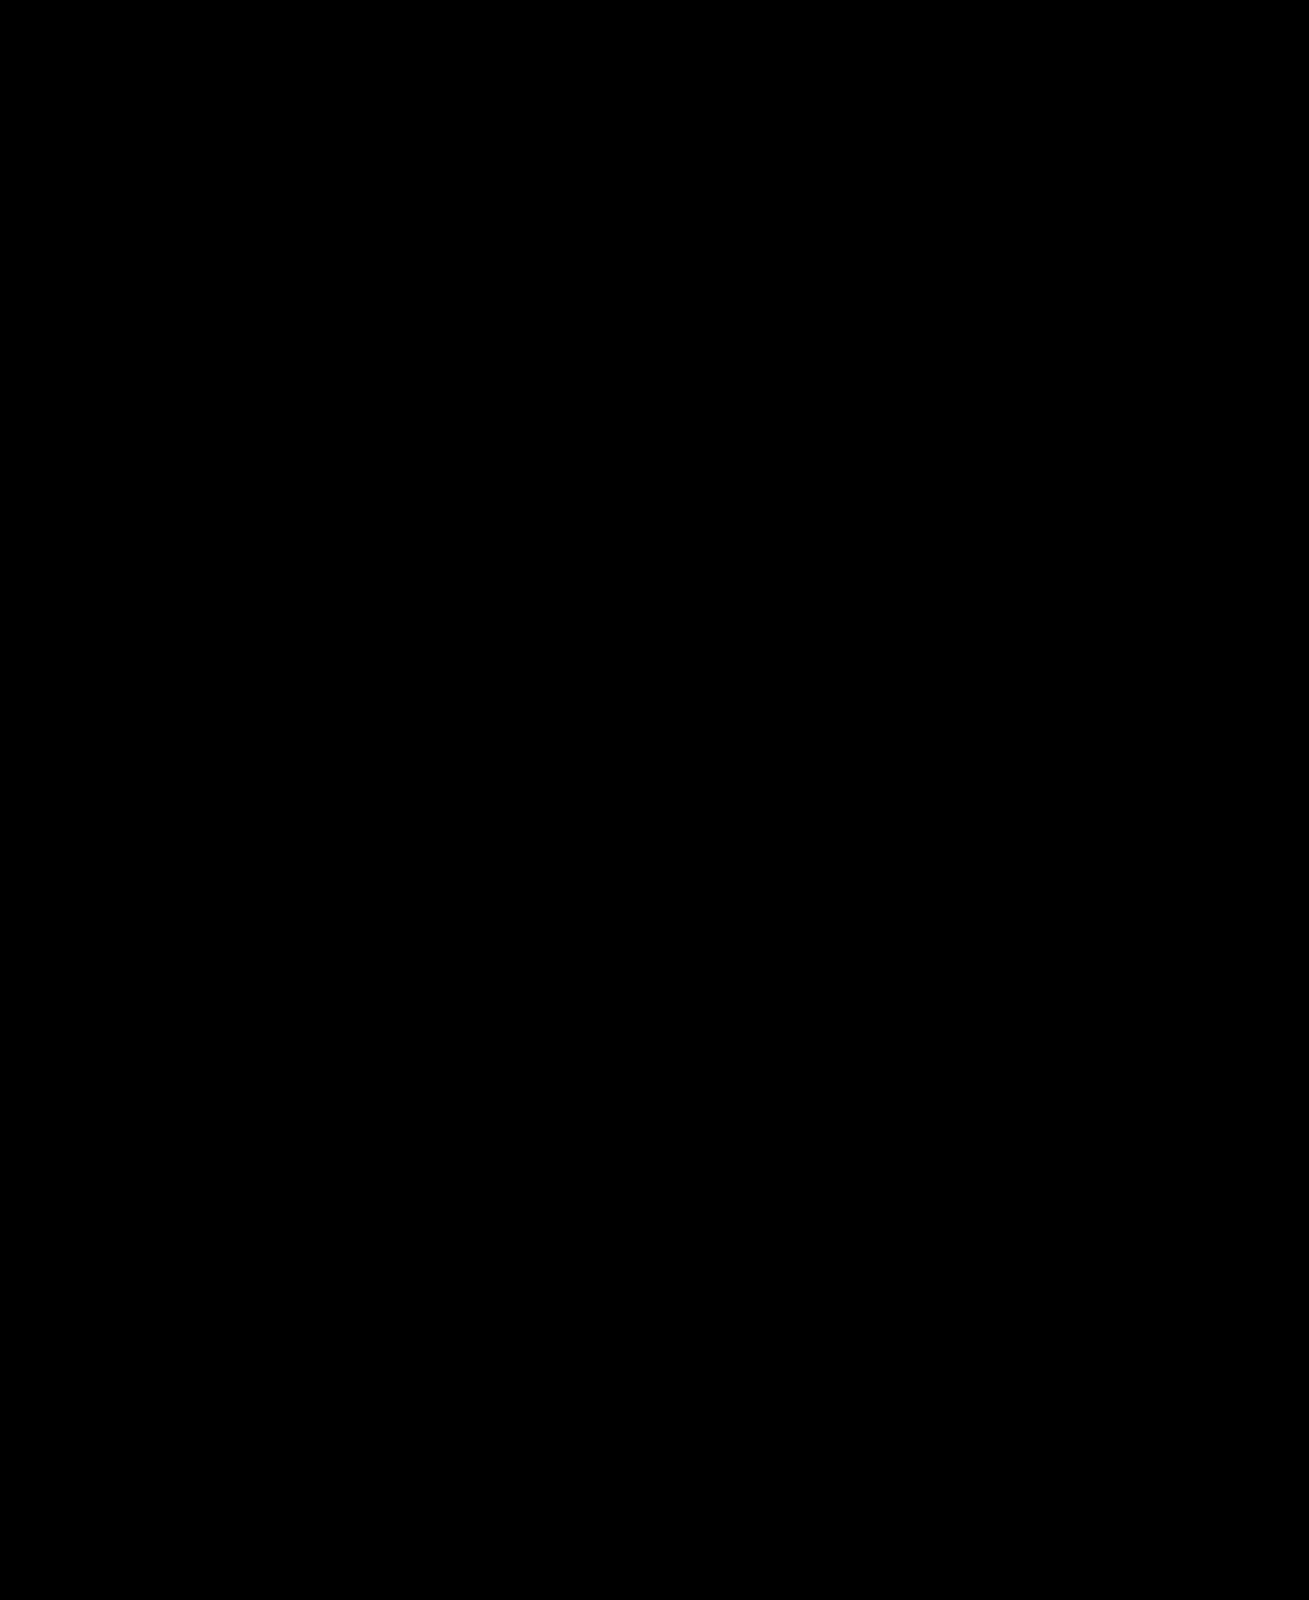 Covered clipart assassin's creed unity Assassin's Unity Assassin's  Logo